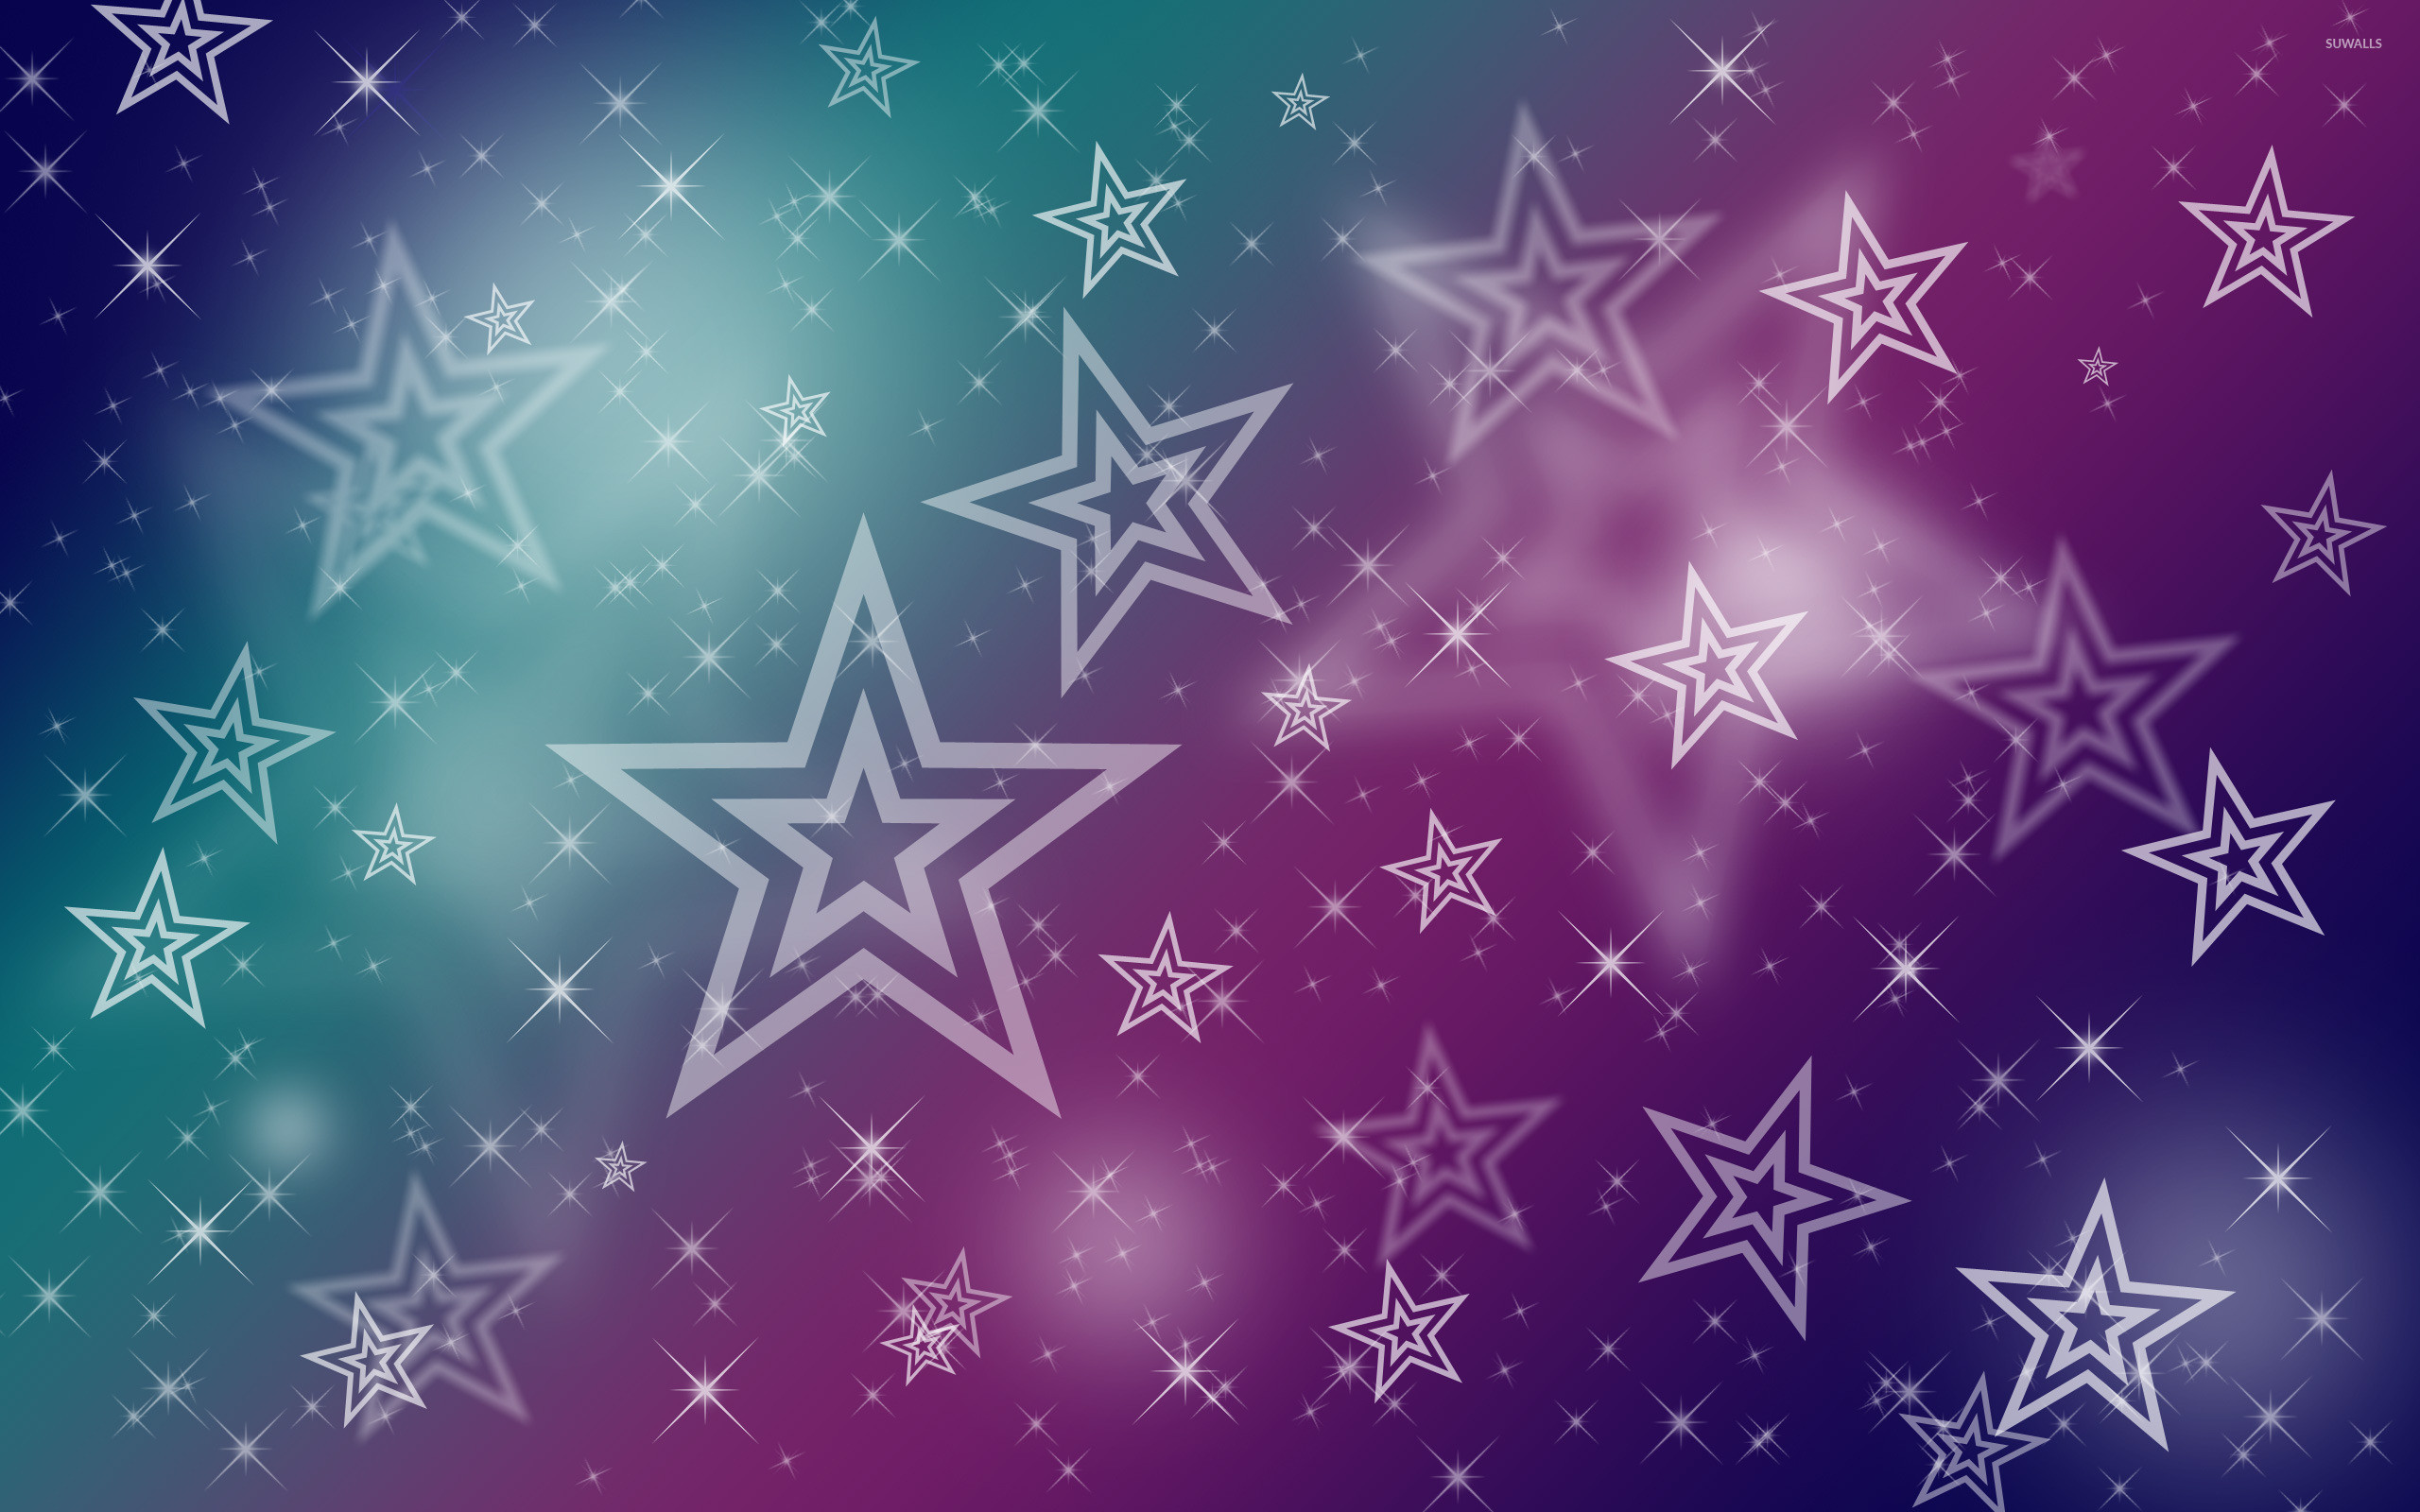 Res: 2560x1600, Stars wallpaper